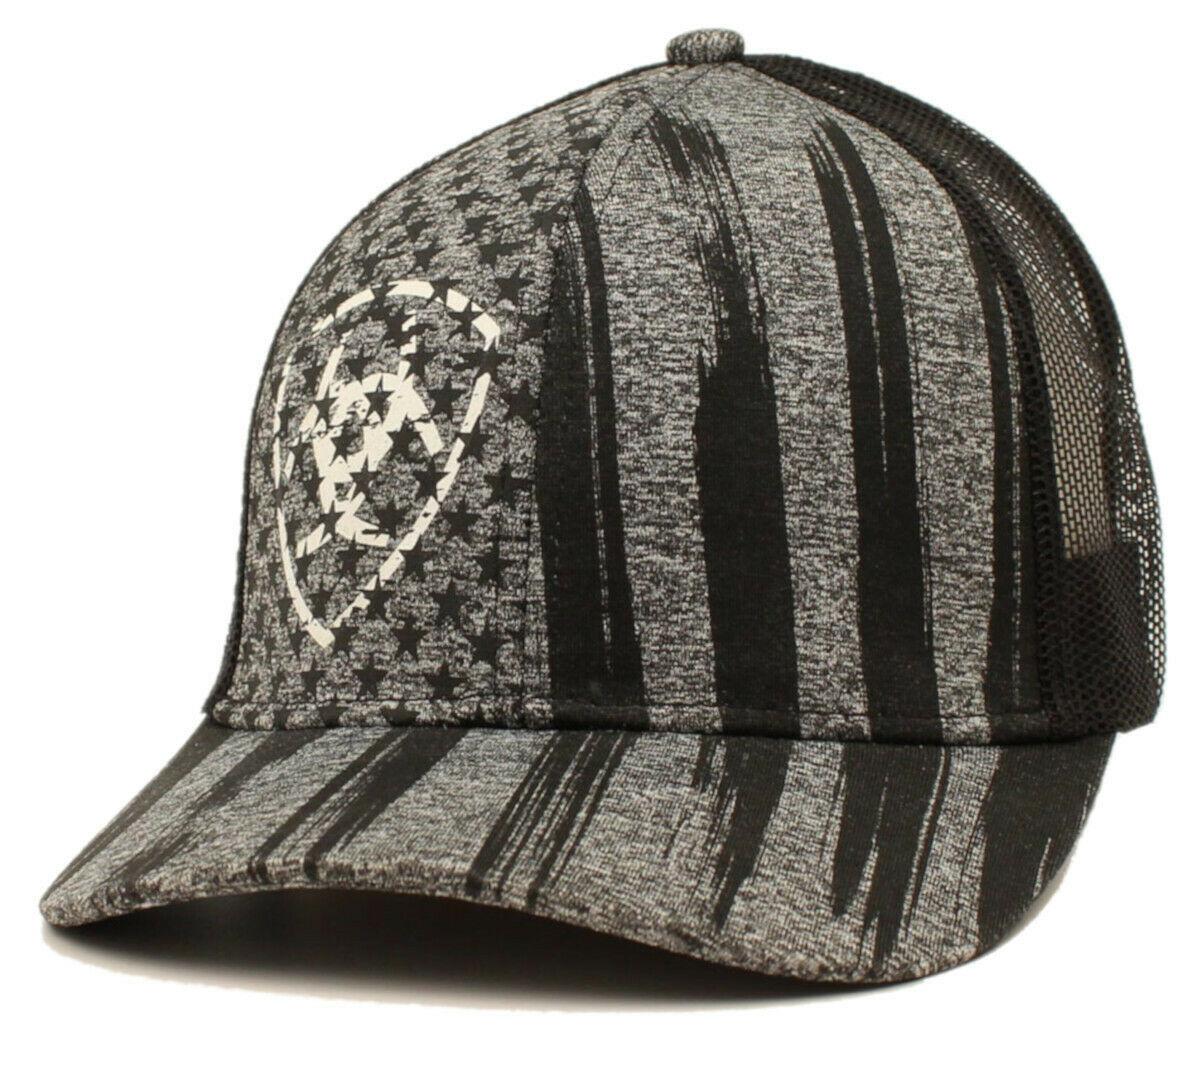 Ariat Snap Hat Stars Black/Grey/White